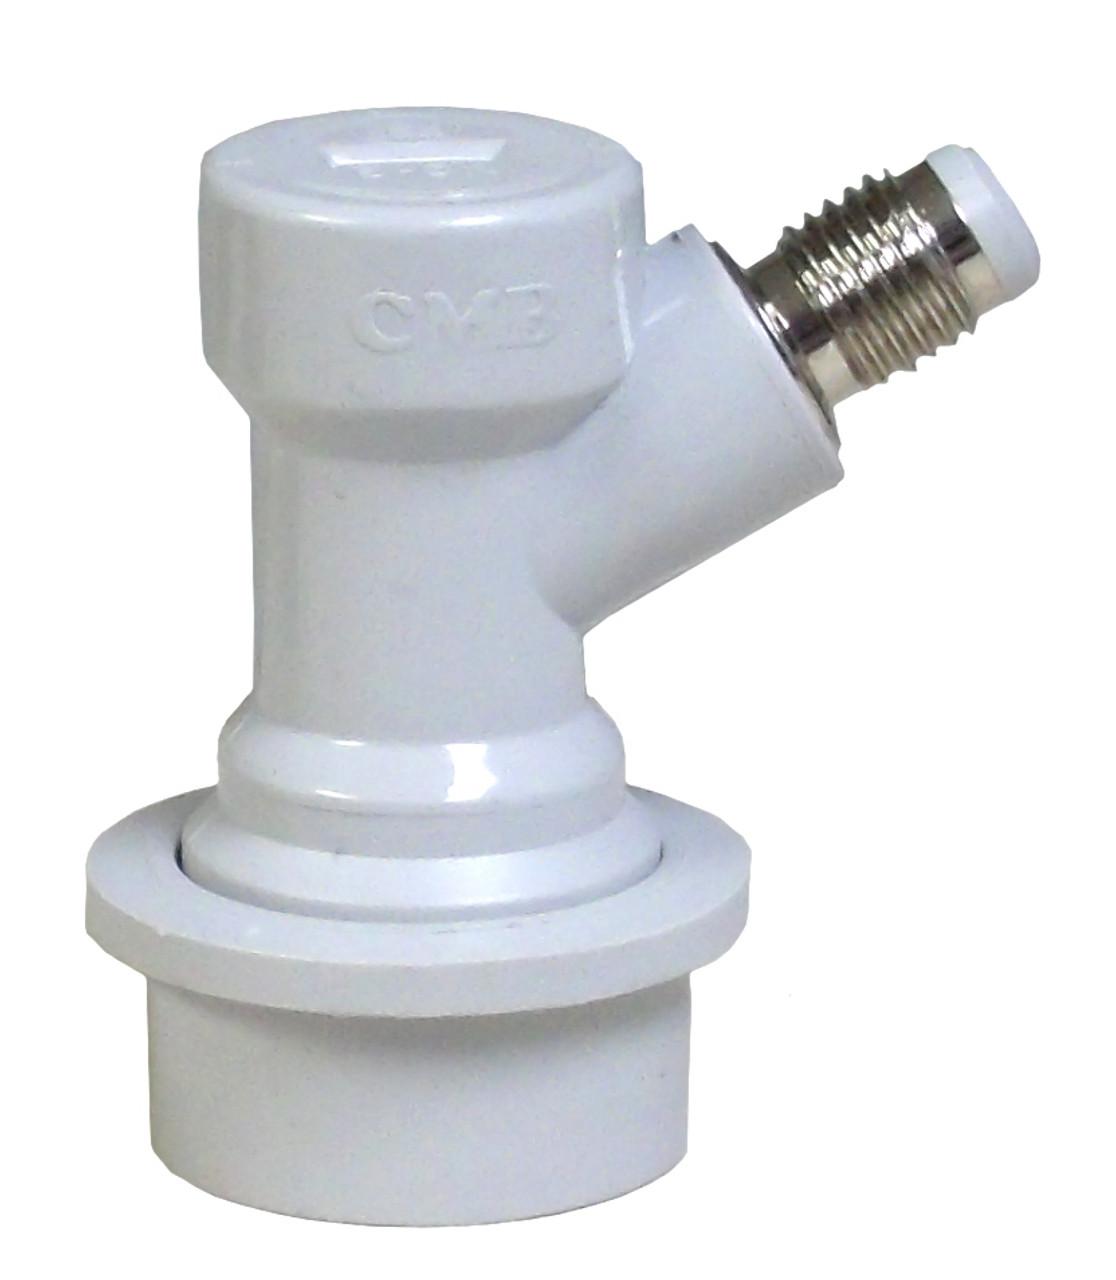 Ball Lock Gas Disconnect - Threaded